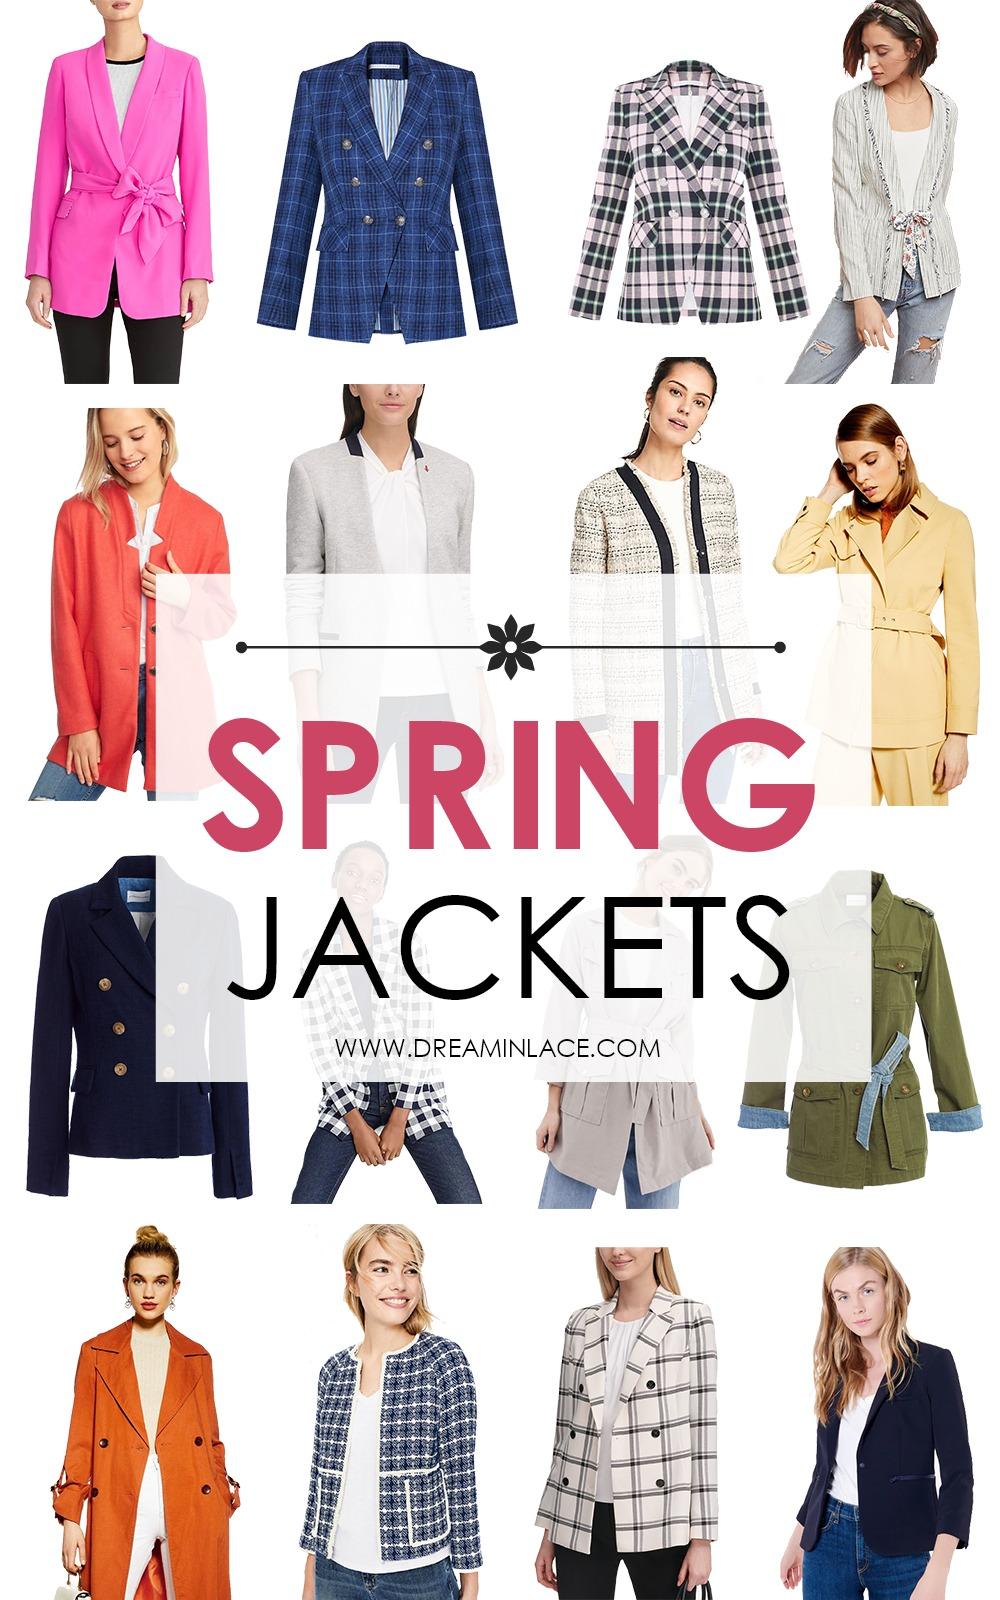 Stylish Spring Jackets on My Radar I DreaminLace.com #SpringFashion #WorkWear #Fashionista #OutfitIdeas